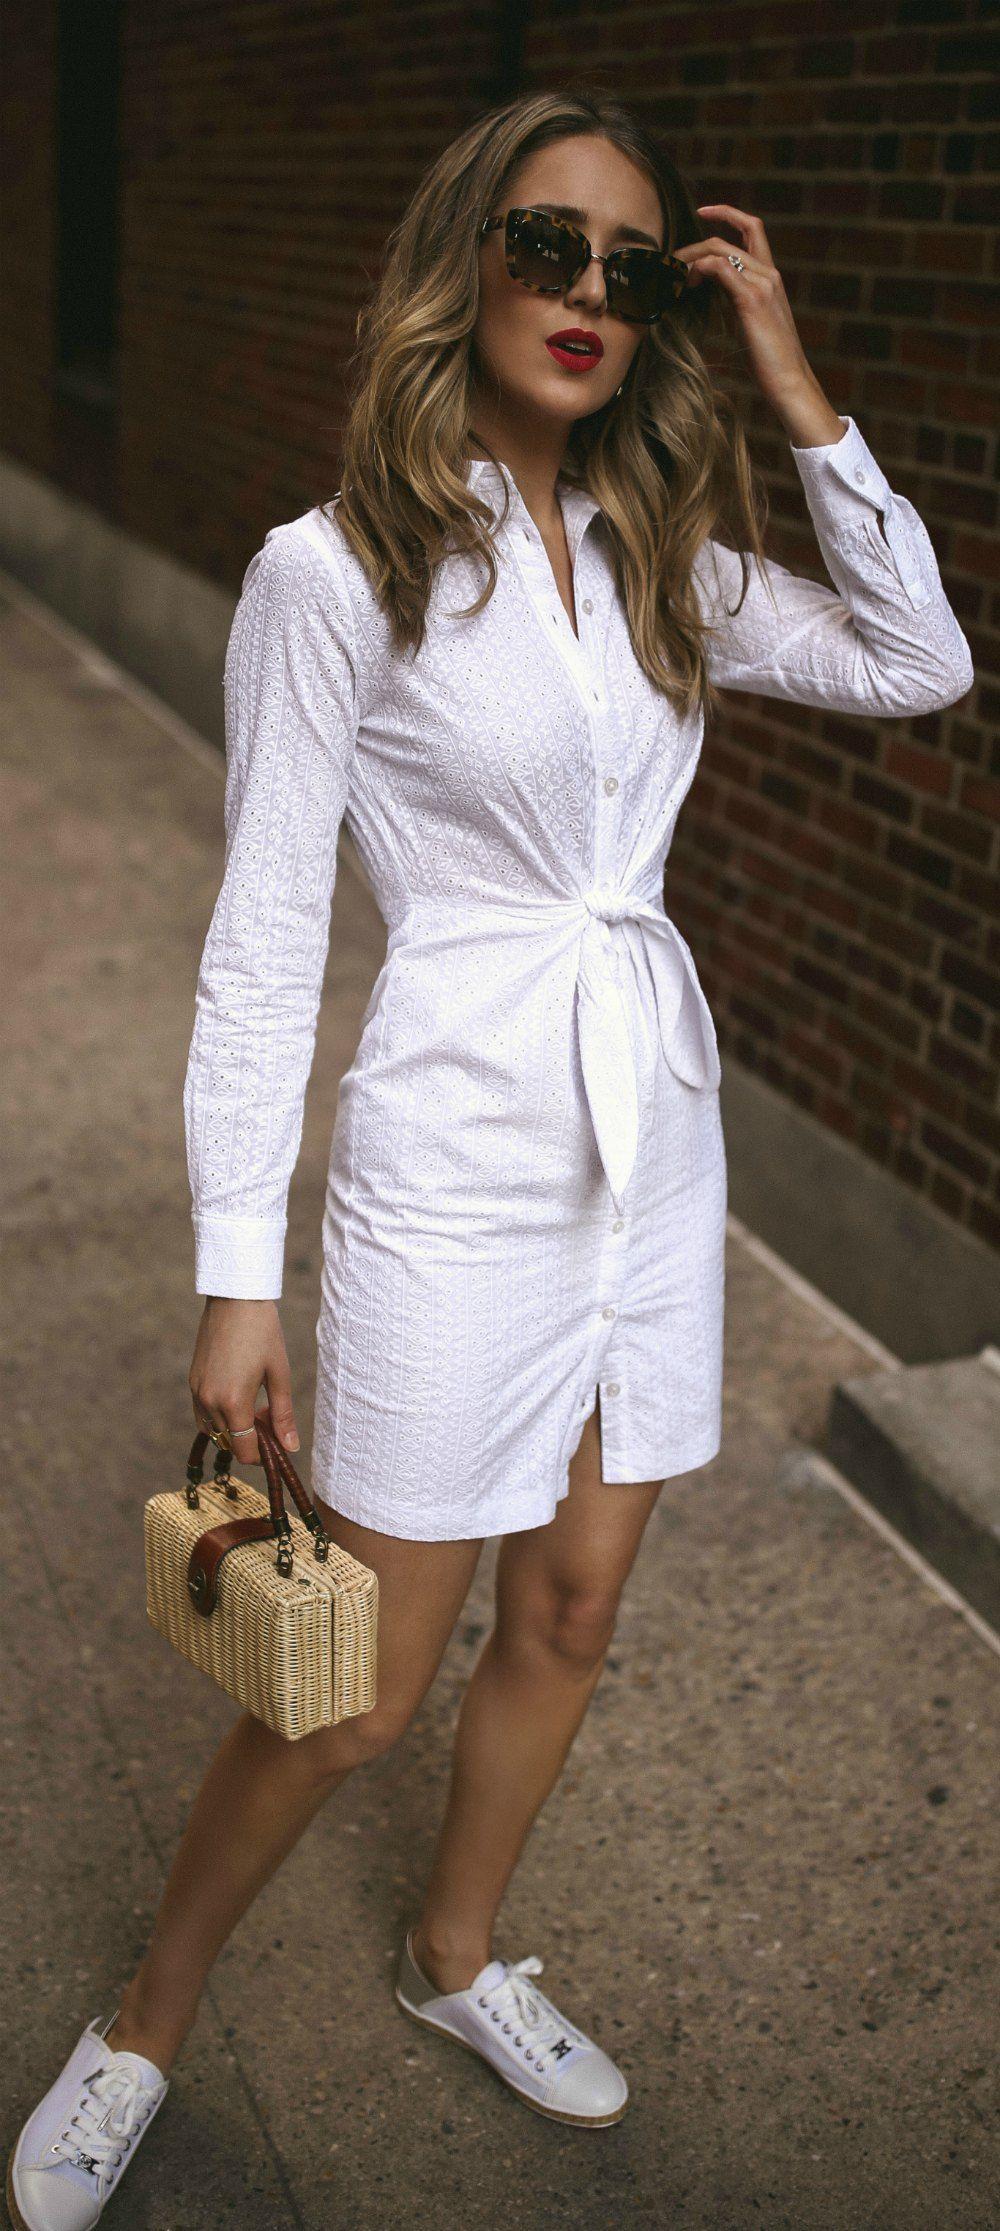 White Eyelet Long Sleeve Tie Waist Mini Shirt Dress Dark Wash Denim Jacket White Espadrille Sneakers Small S White Dress Outfit Casual Dress Outfits Fashion [ 2231 x 1000 Pixel ]